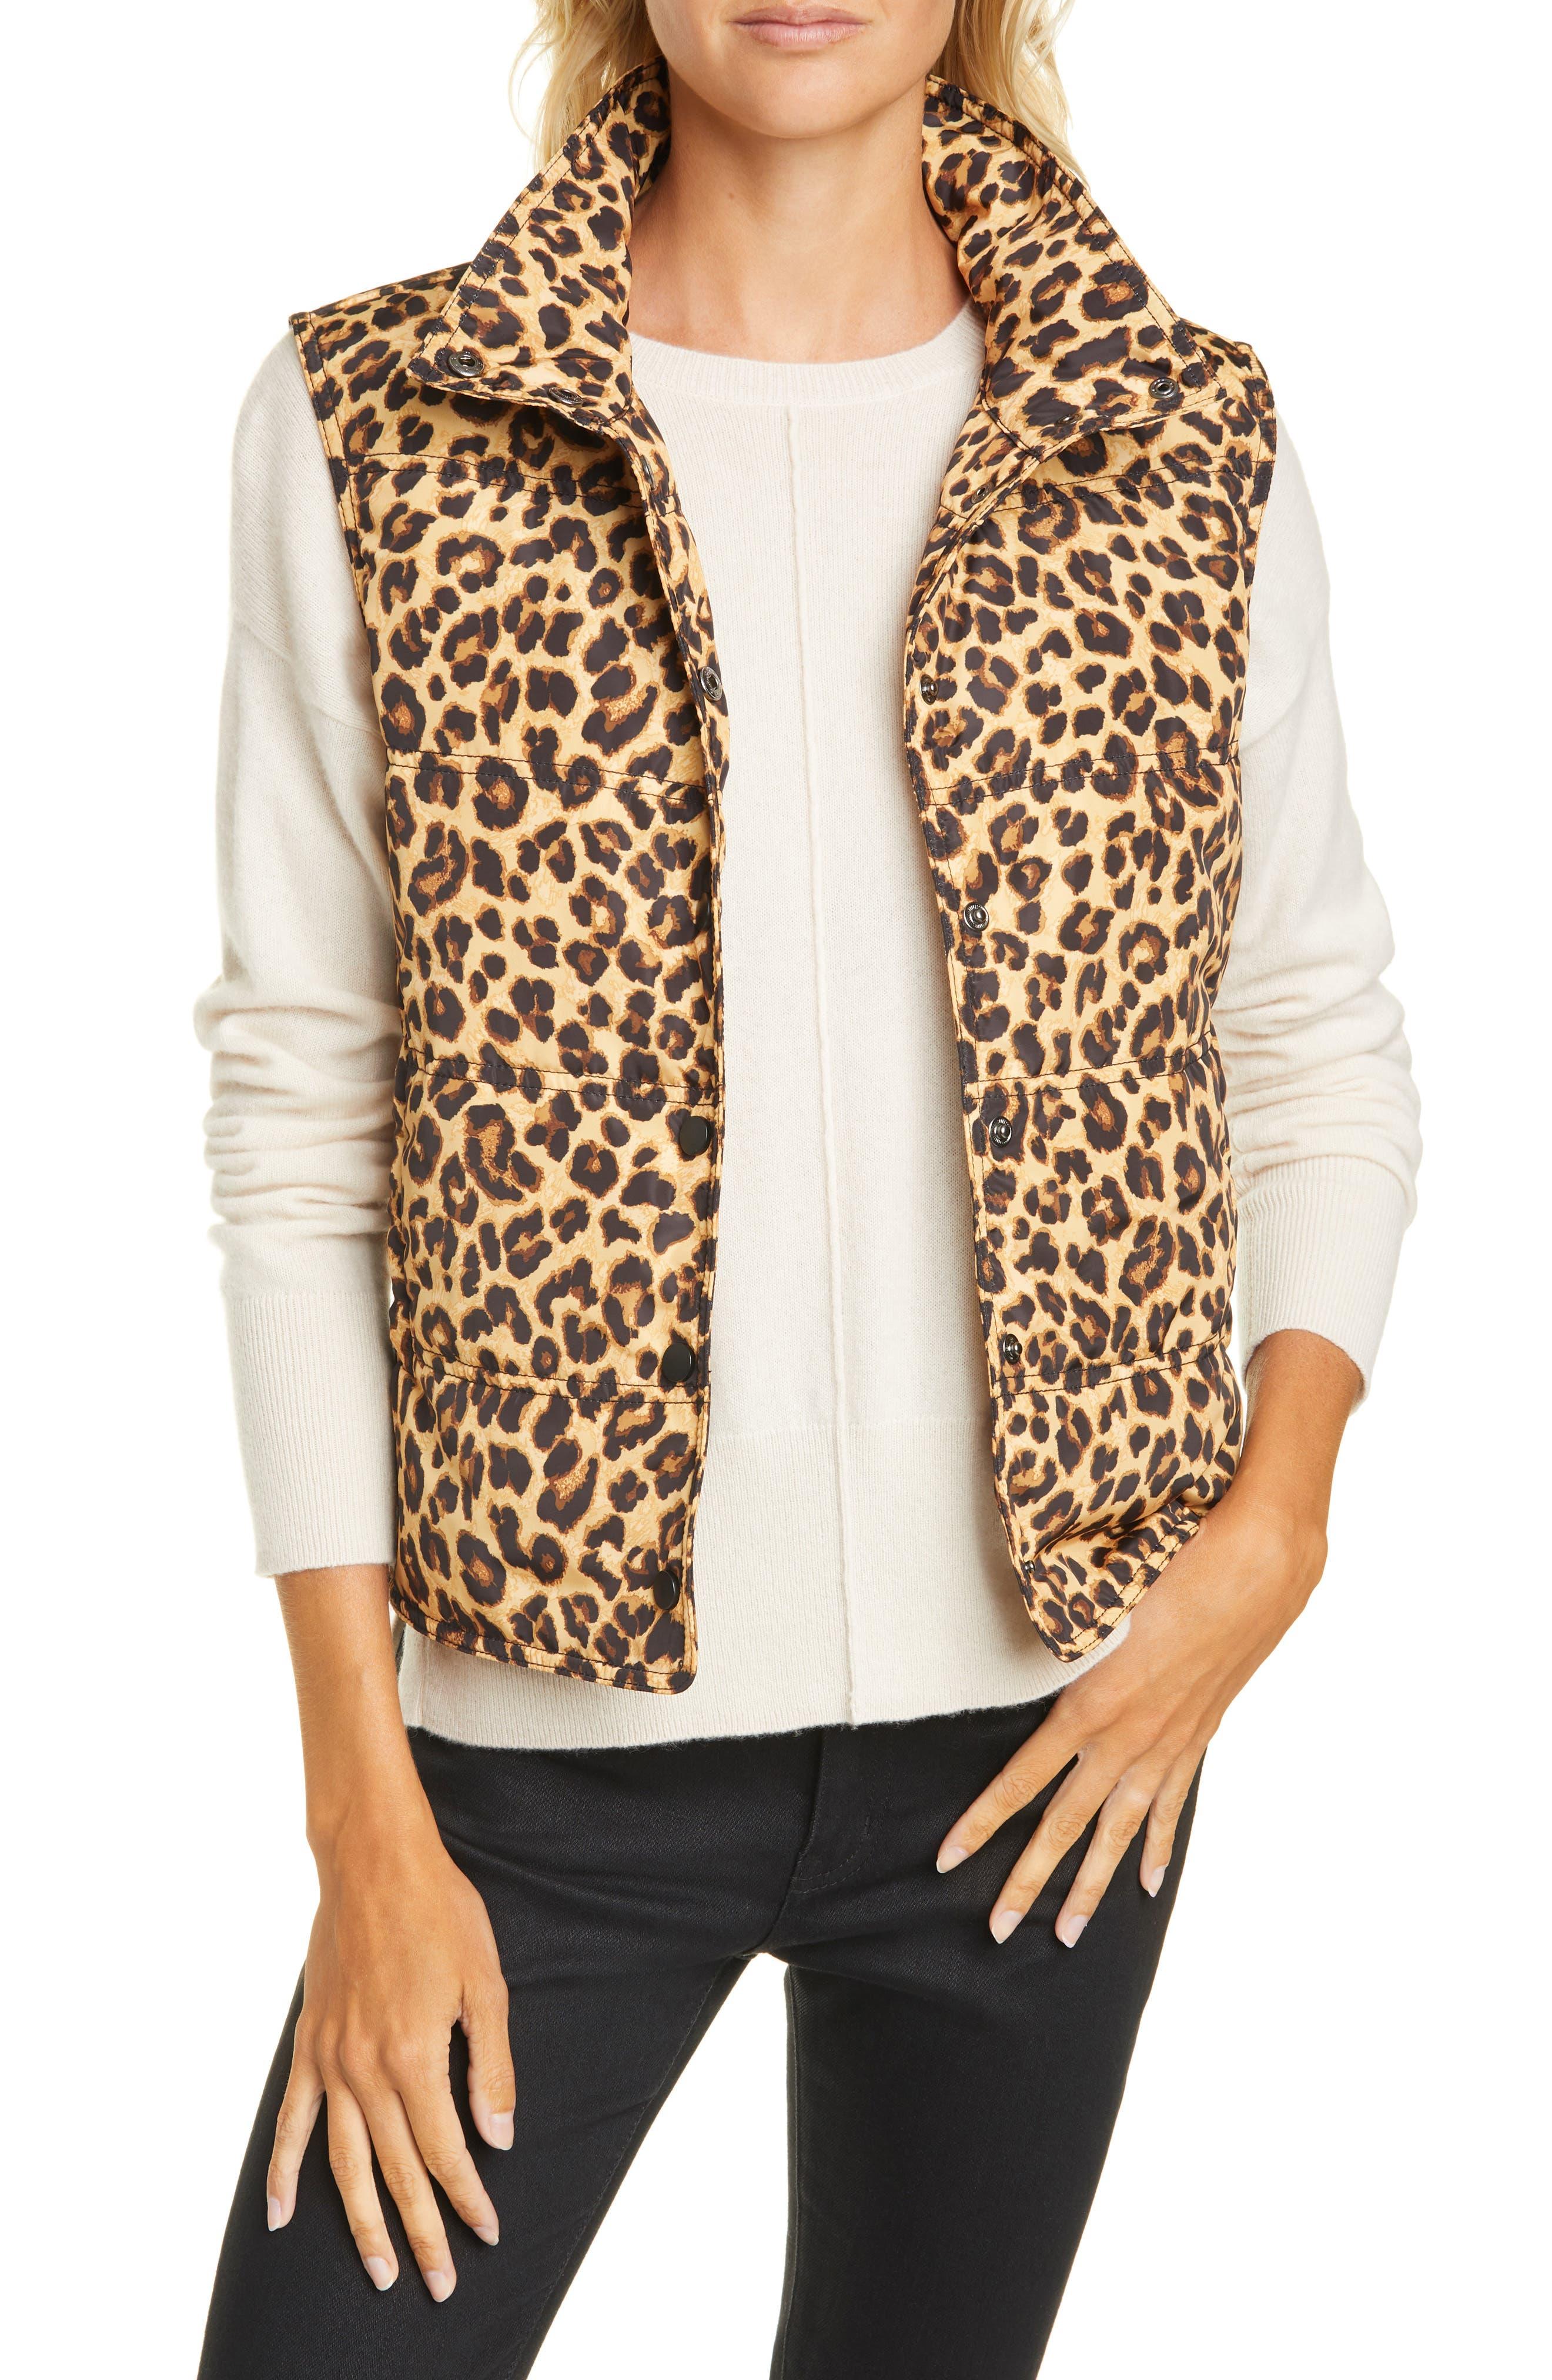 Leopard Puffer Vest Monogrammed Women\u2019s Puffer Vest Black and Gray Leopard Print Outerwear